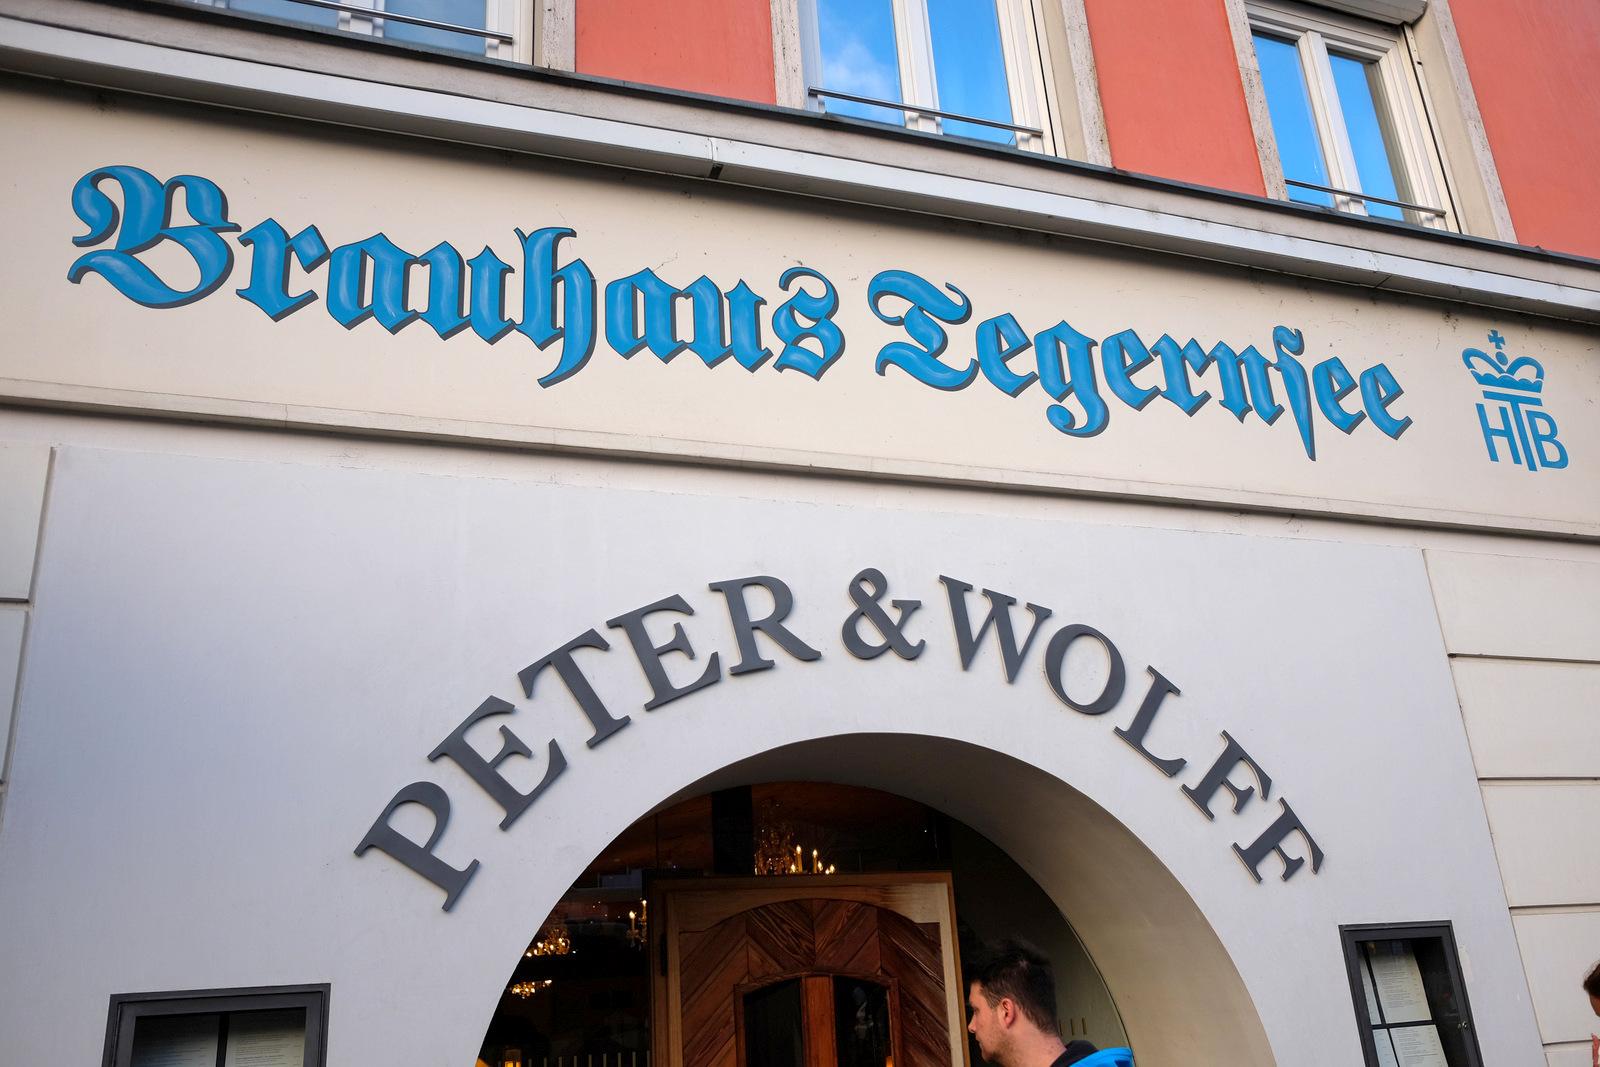 Peter & Wolff @ Munich